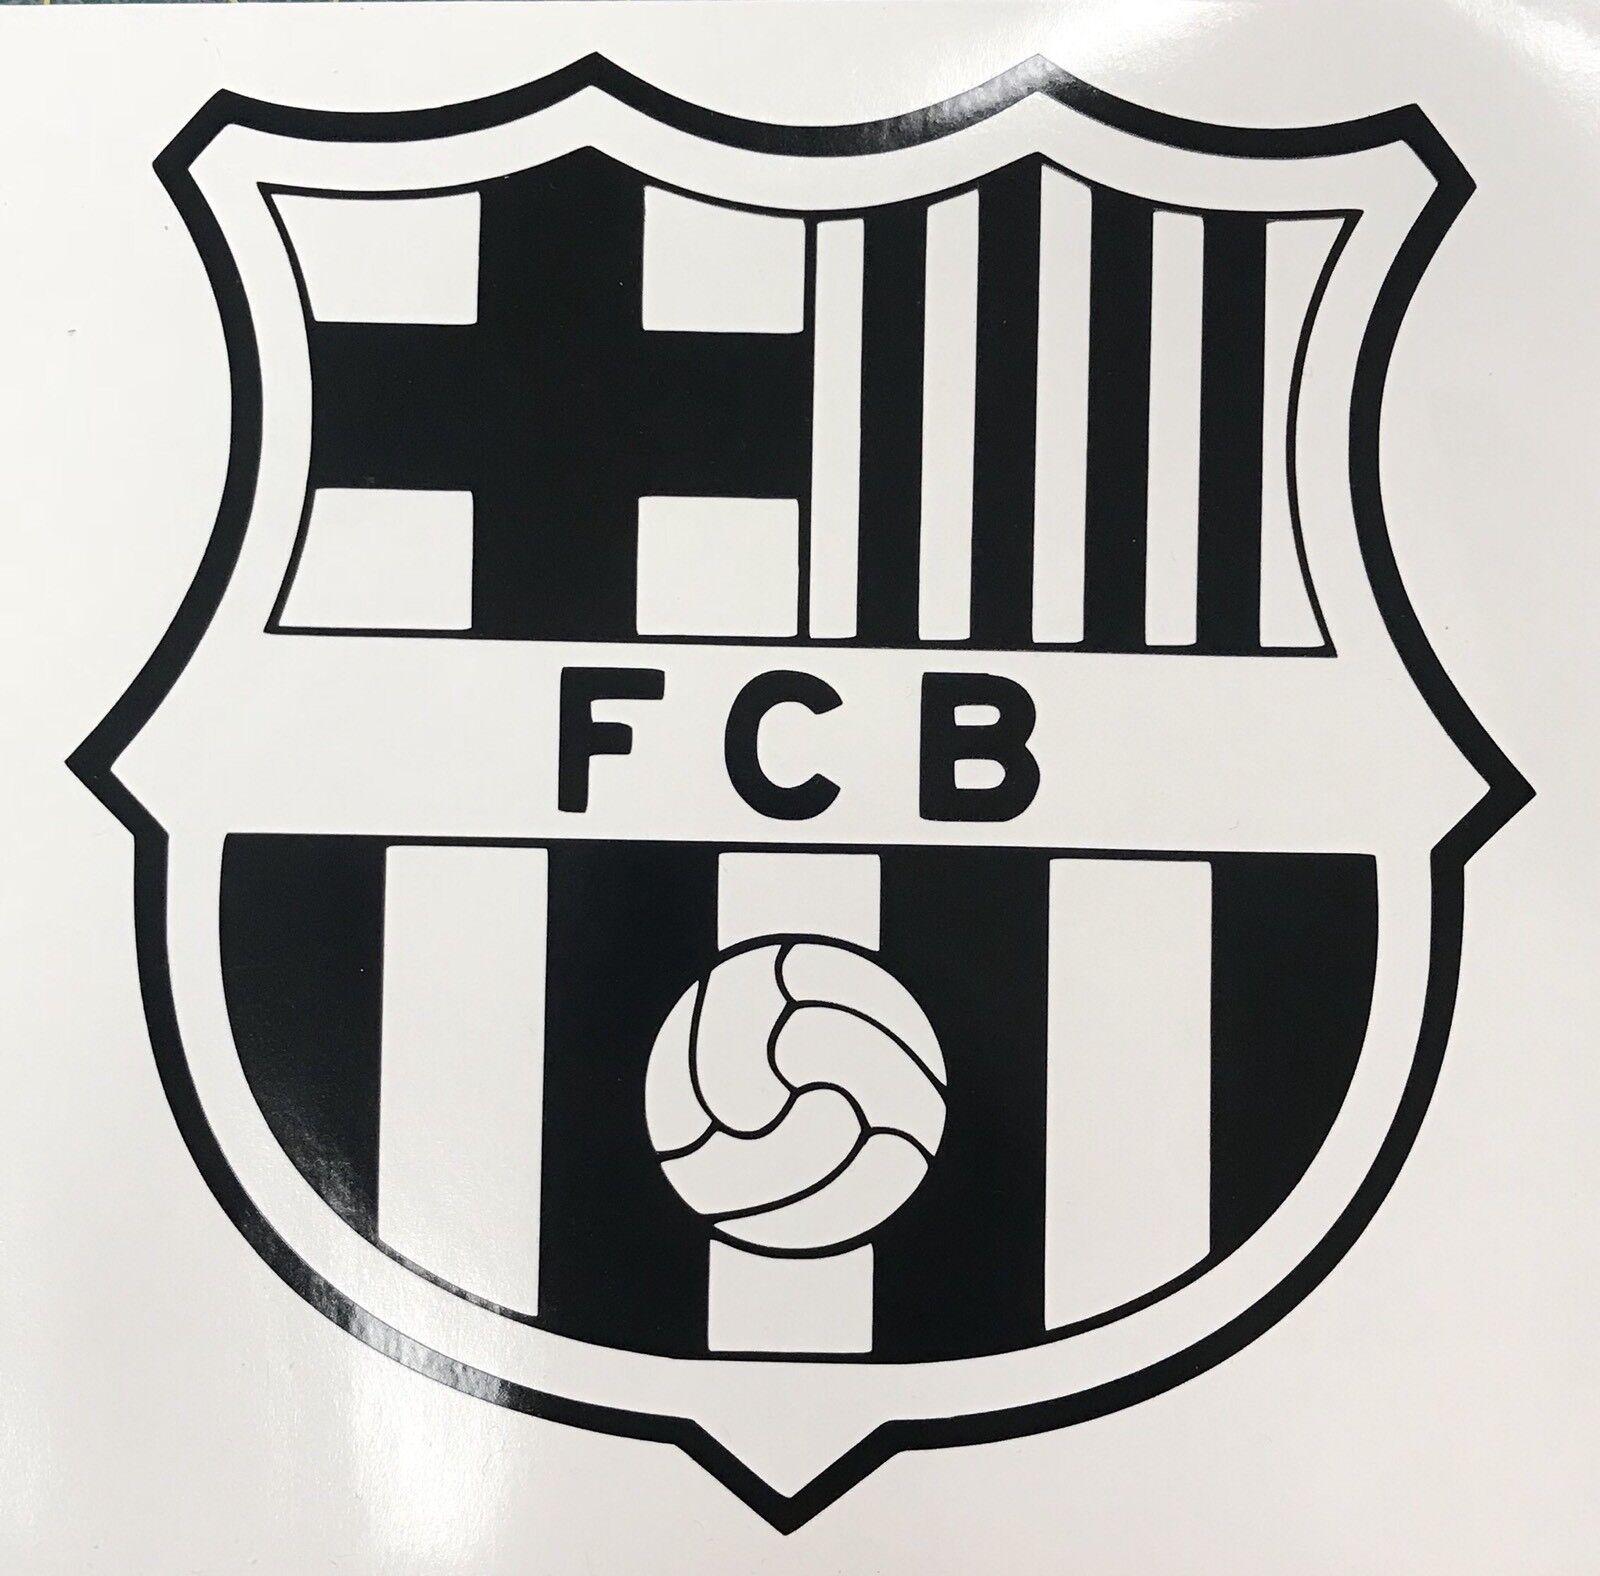 Fc Barcelona Logo Spain Soccer Football Club Vinyl Sticker Decal Car Decoration For Sale Online Ebay